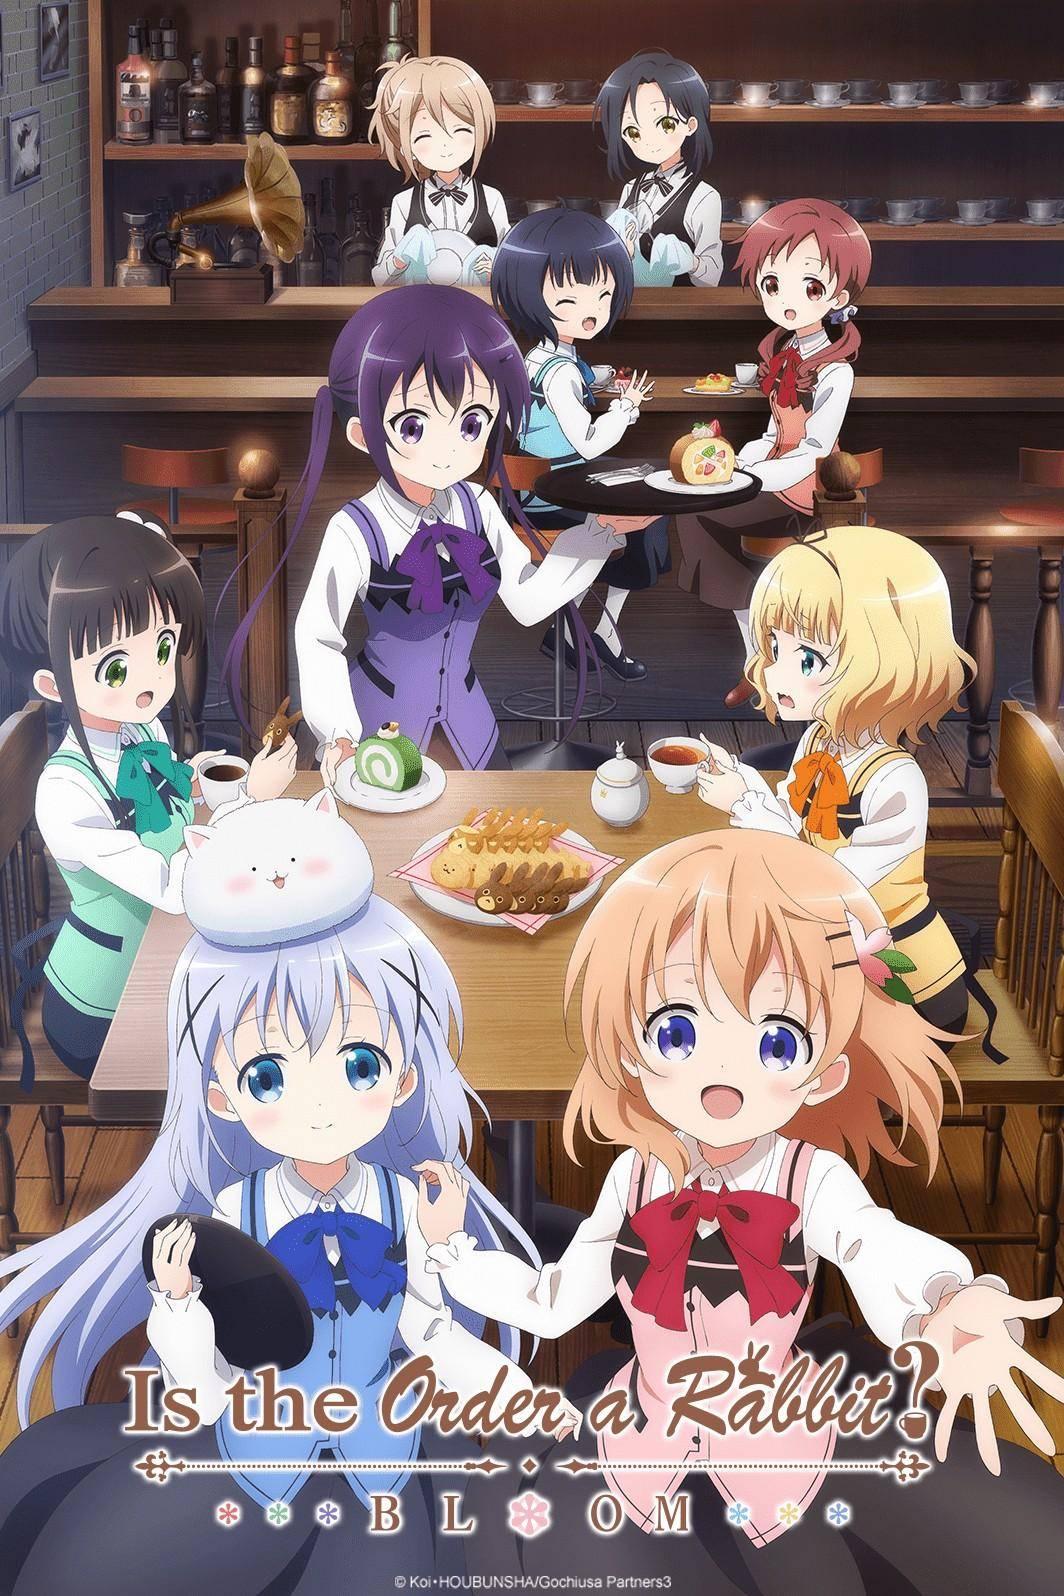 unnamed-3-1 - Gochumon wa Usagi Desu ka? Bloom [03/12] (Ligero) (Emisión) - Anime Ligero [Descargas]